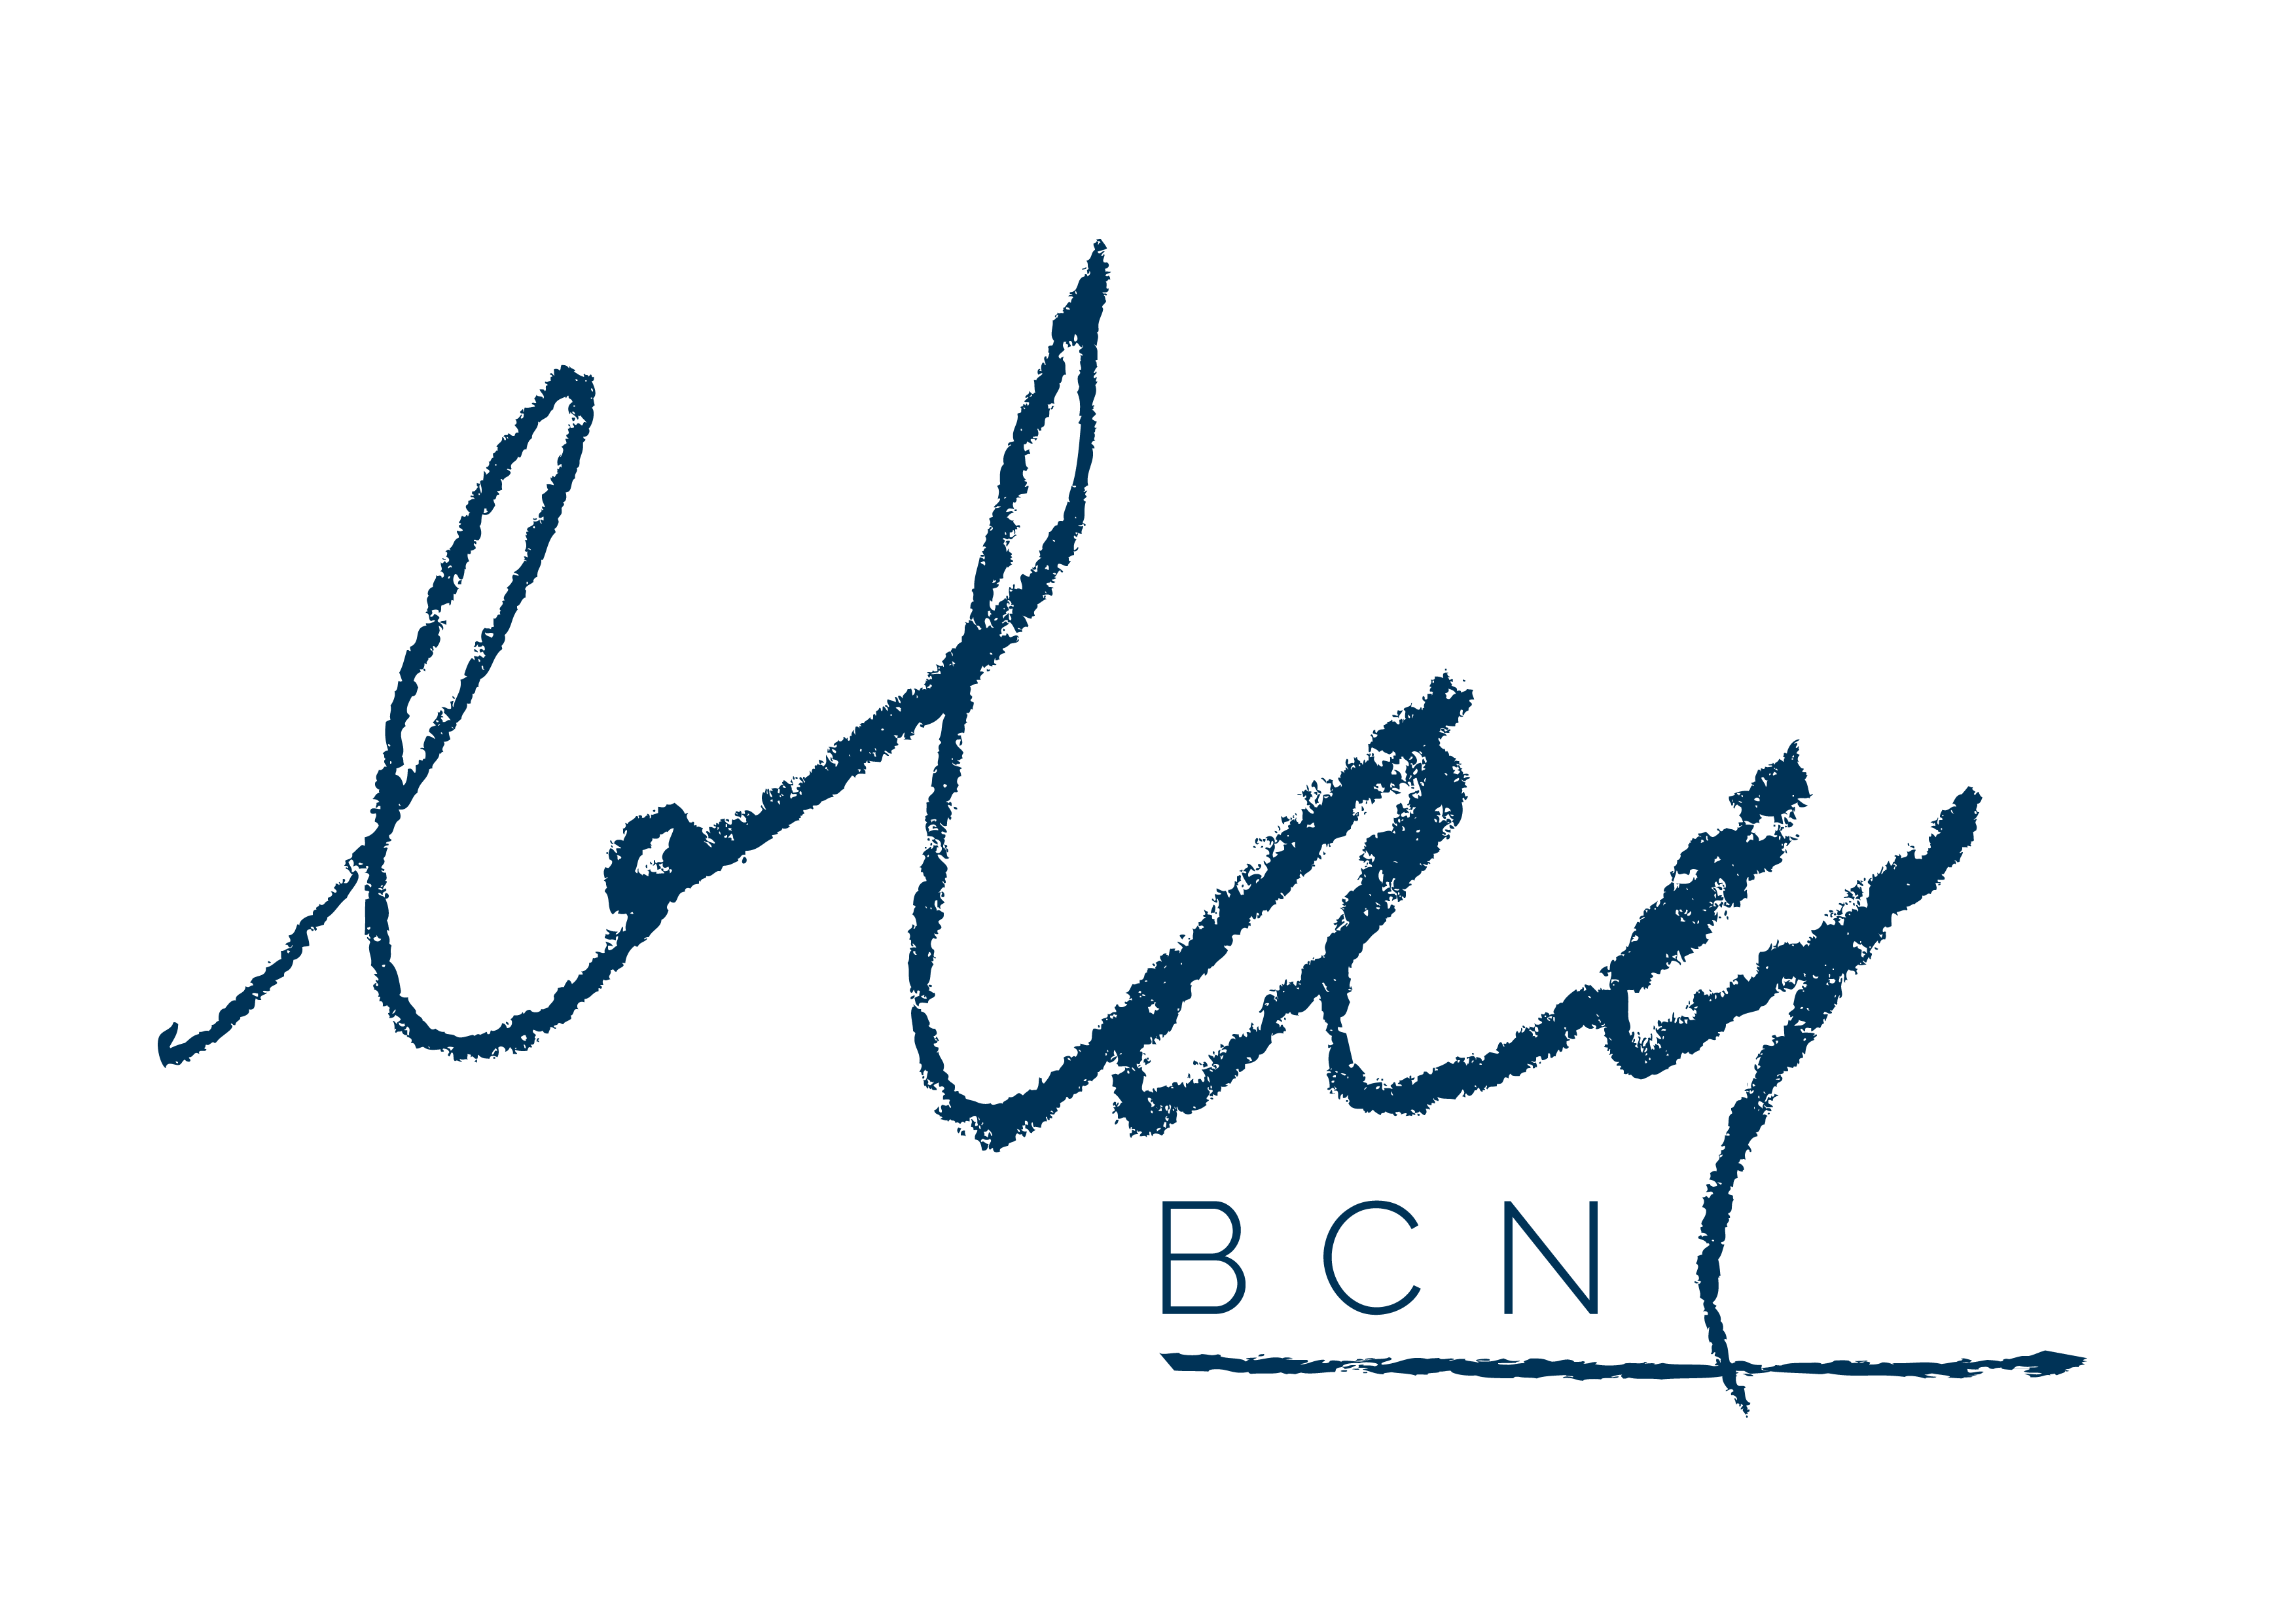 Blau BCN